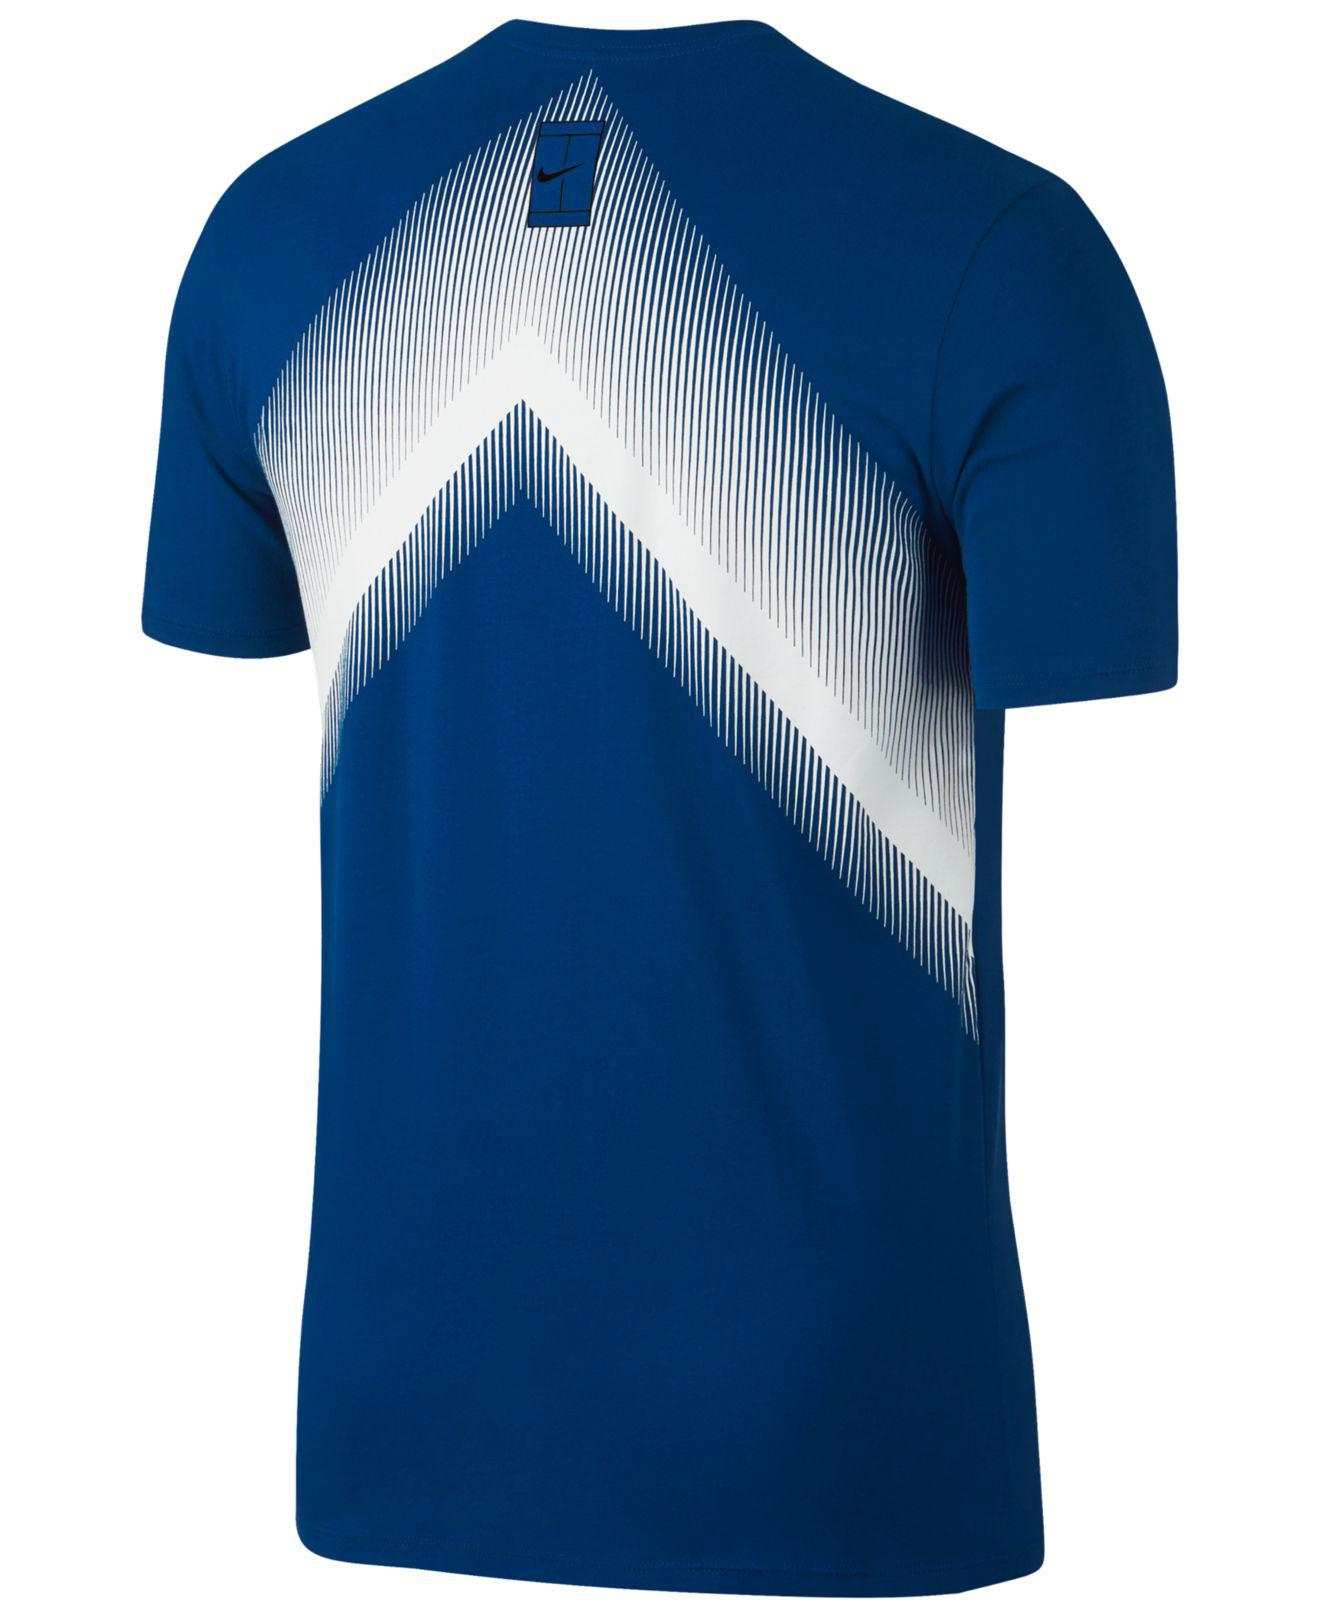 Nike Cotton Men S Rafael Nadal Logo T Shirt In Blue For Men Lyst